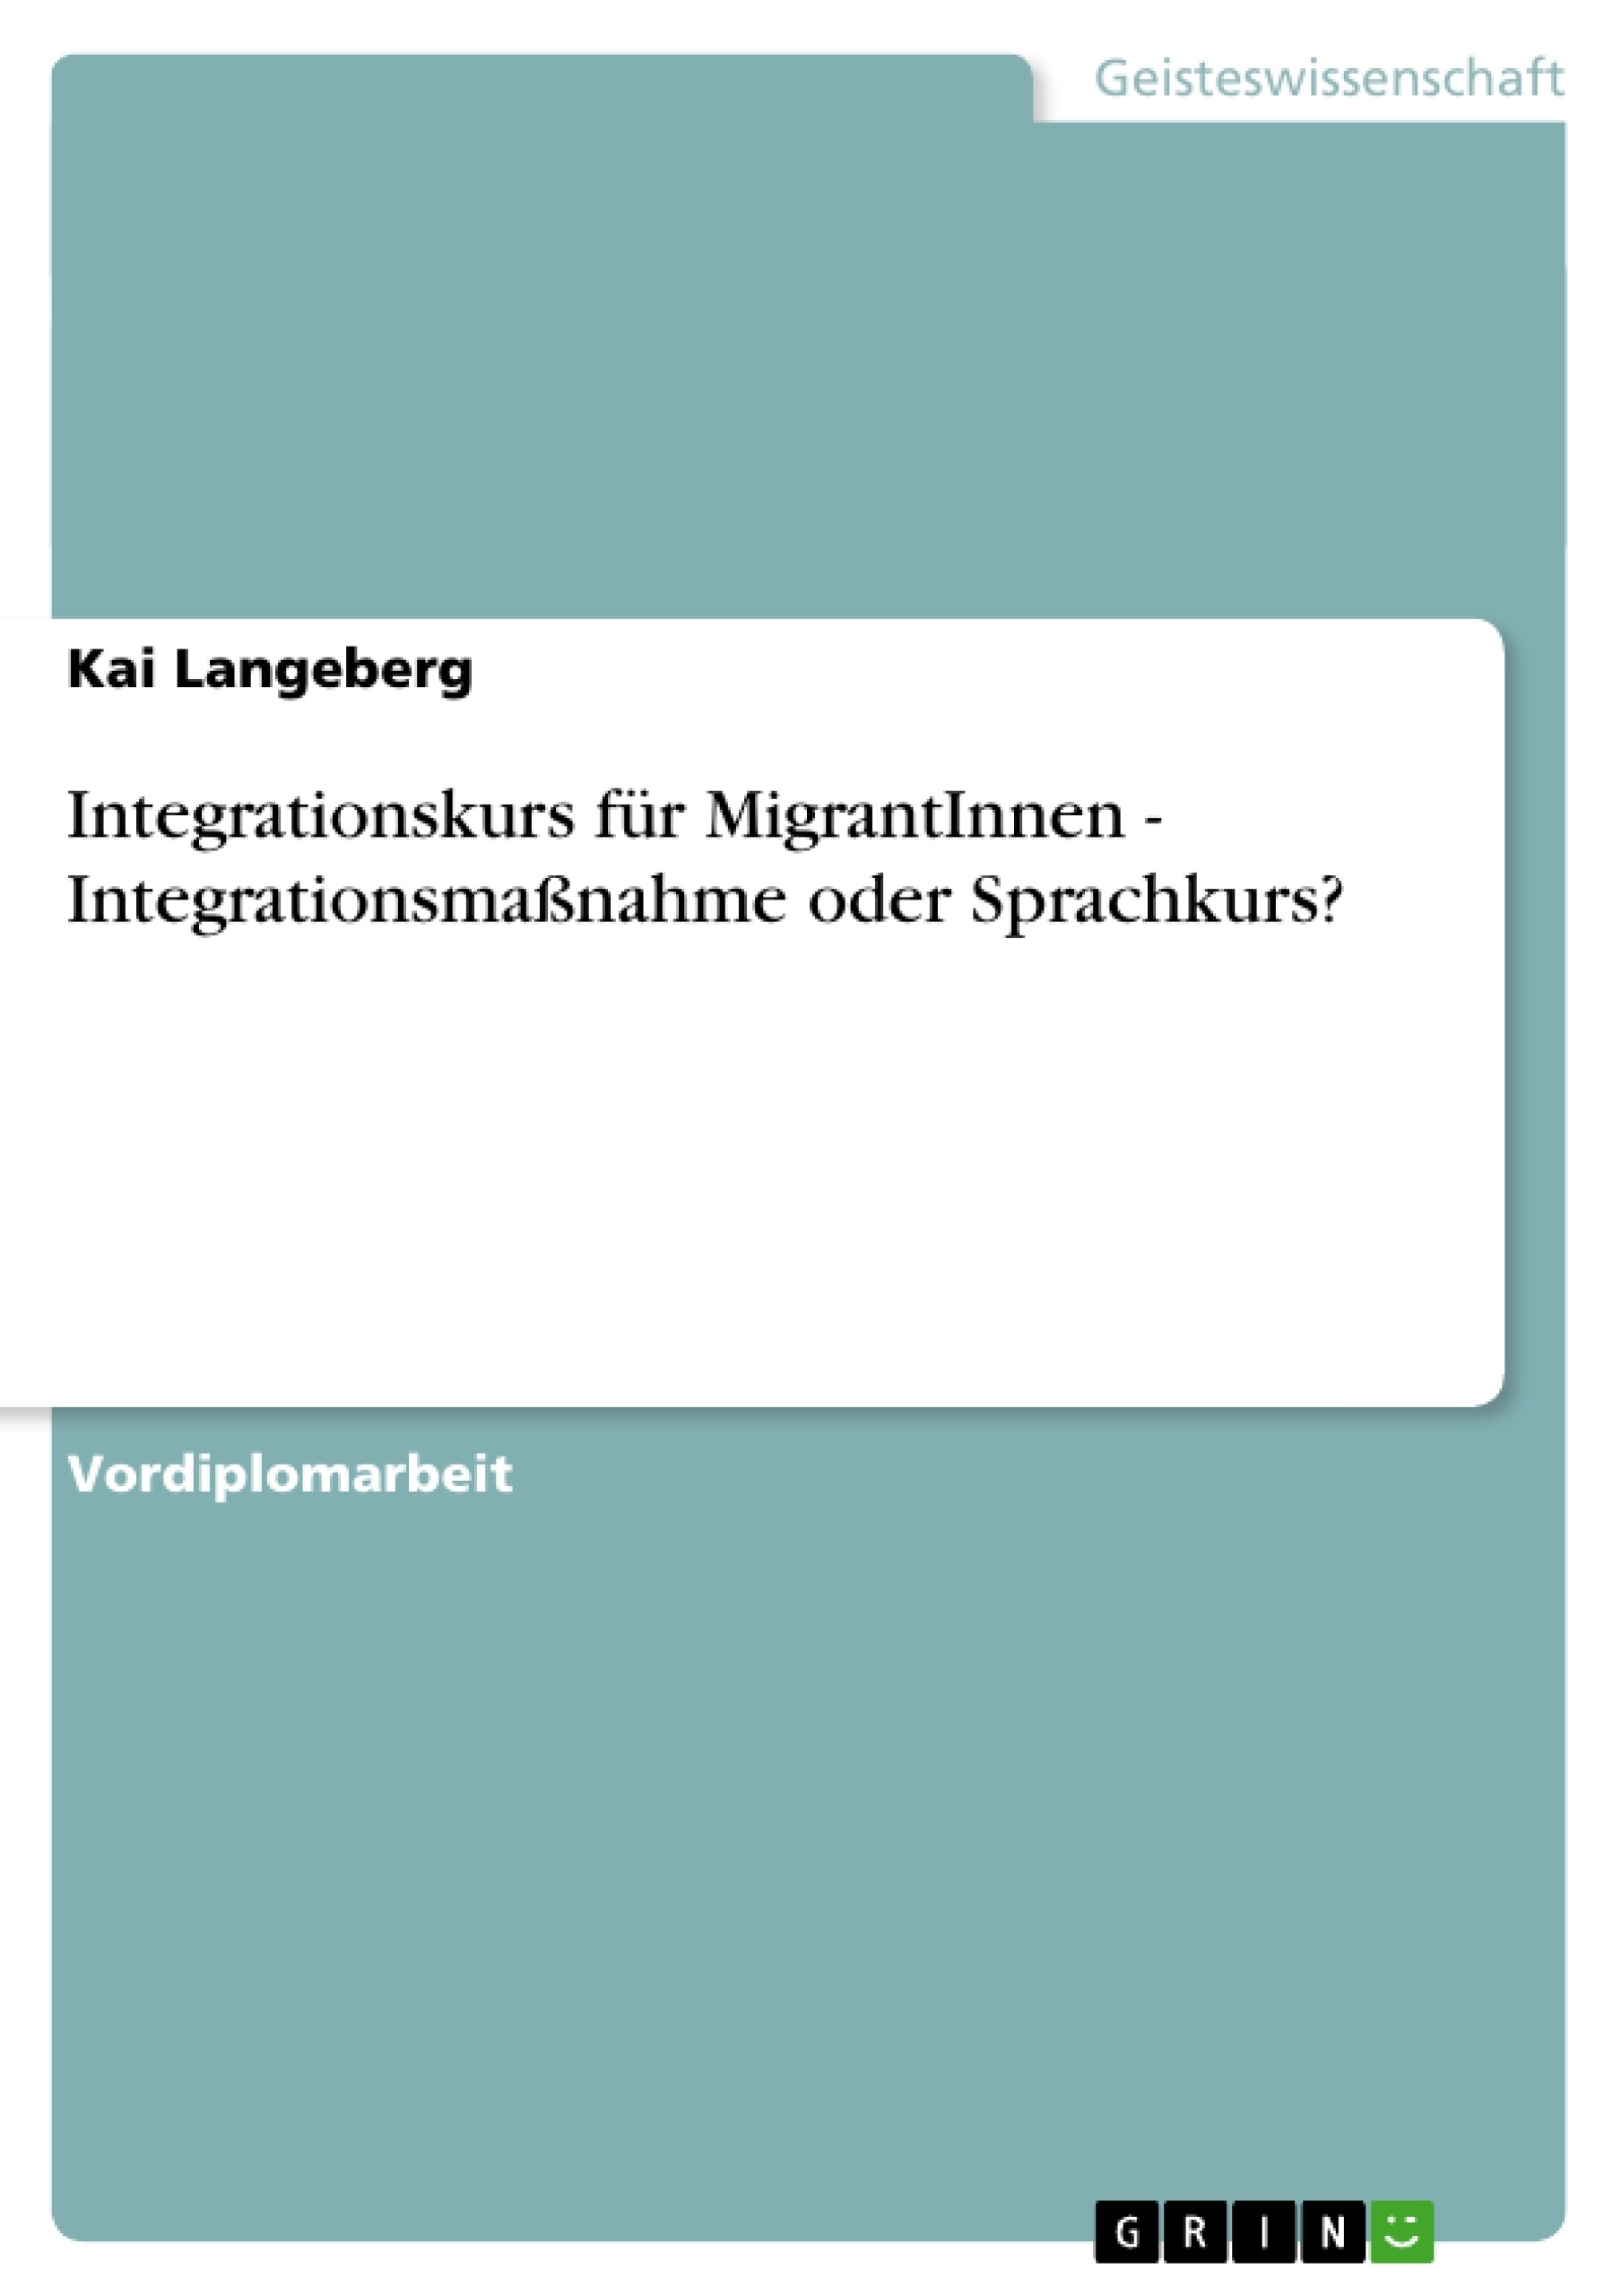 Titel: Integrationskurs für MigrantInnen - Integrationsmaßnahme oder Sprachkurs?